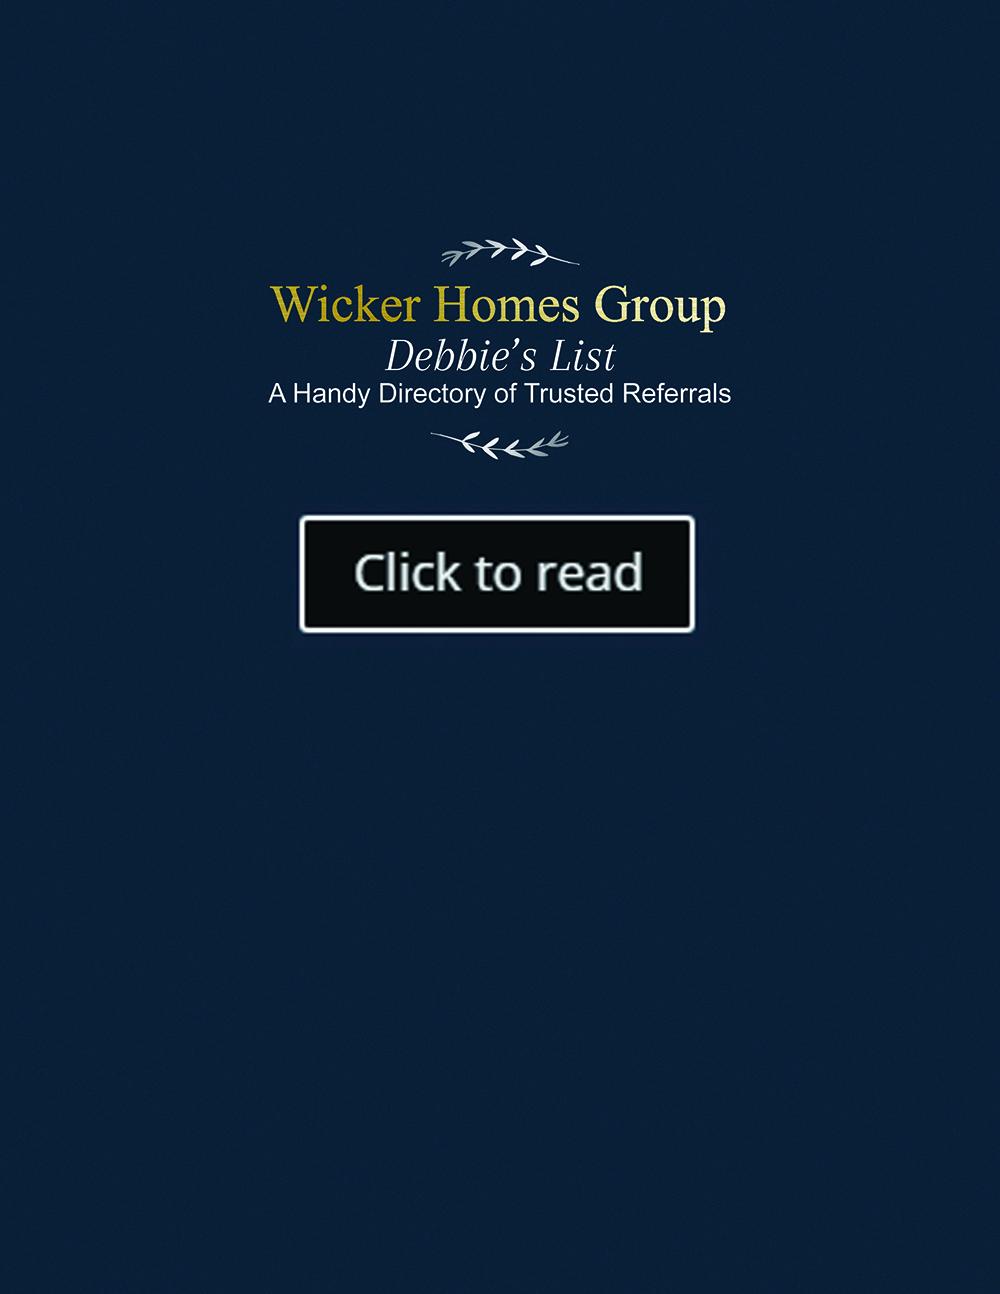 Debbie's List Real Estate Business Directory Virginia